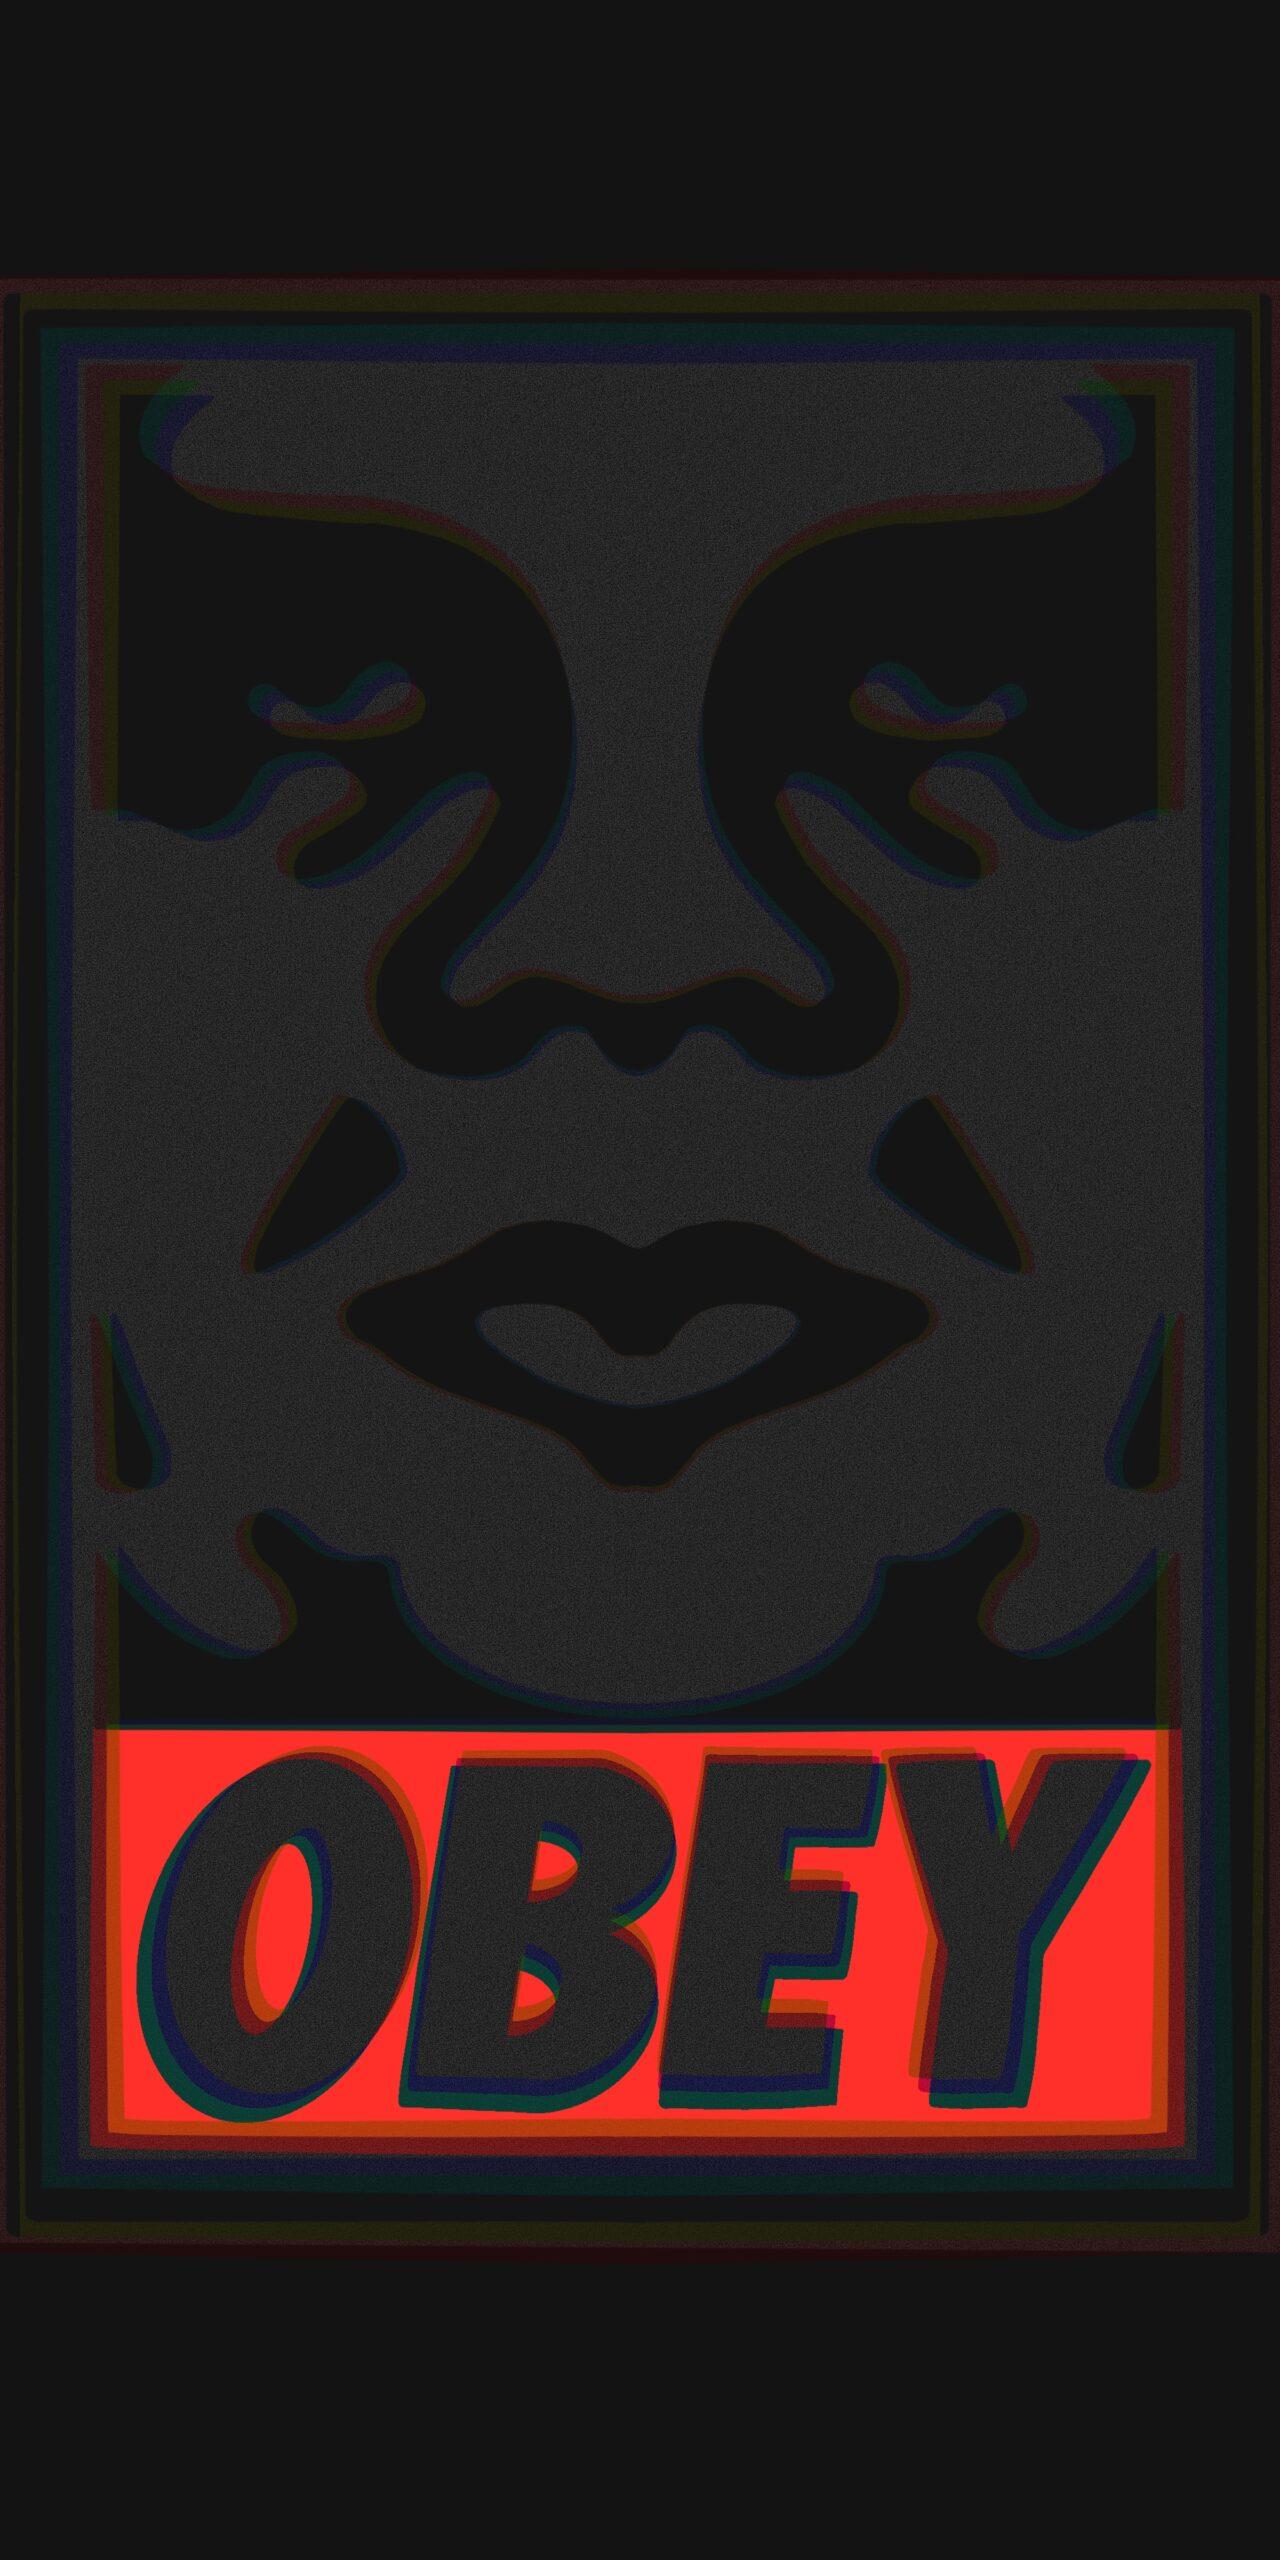 obey dark wallpaper